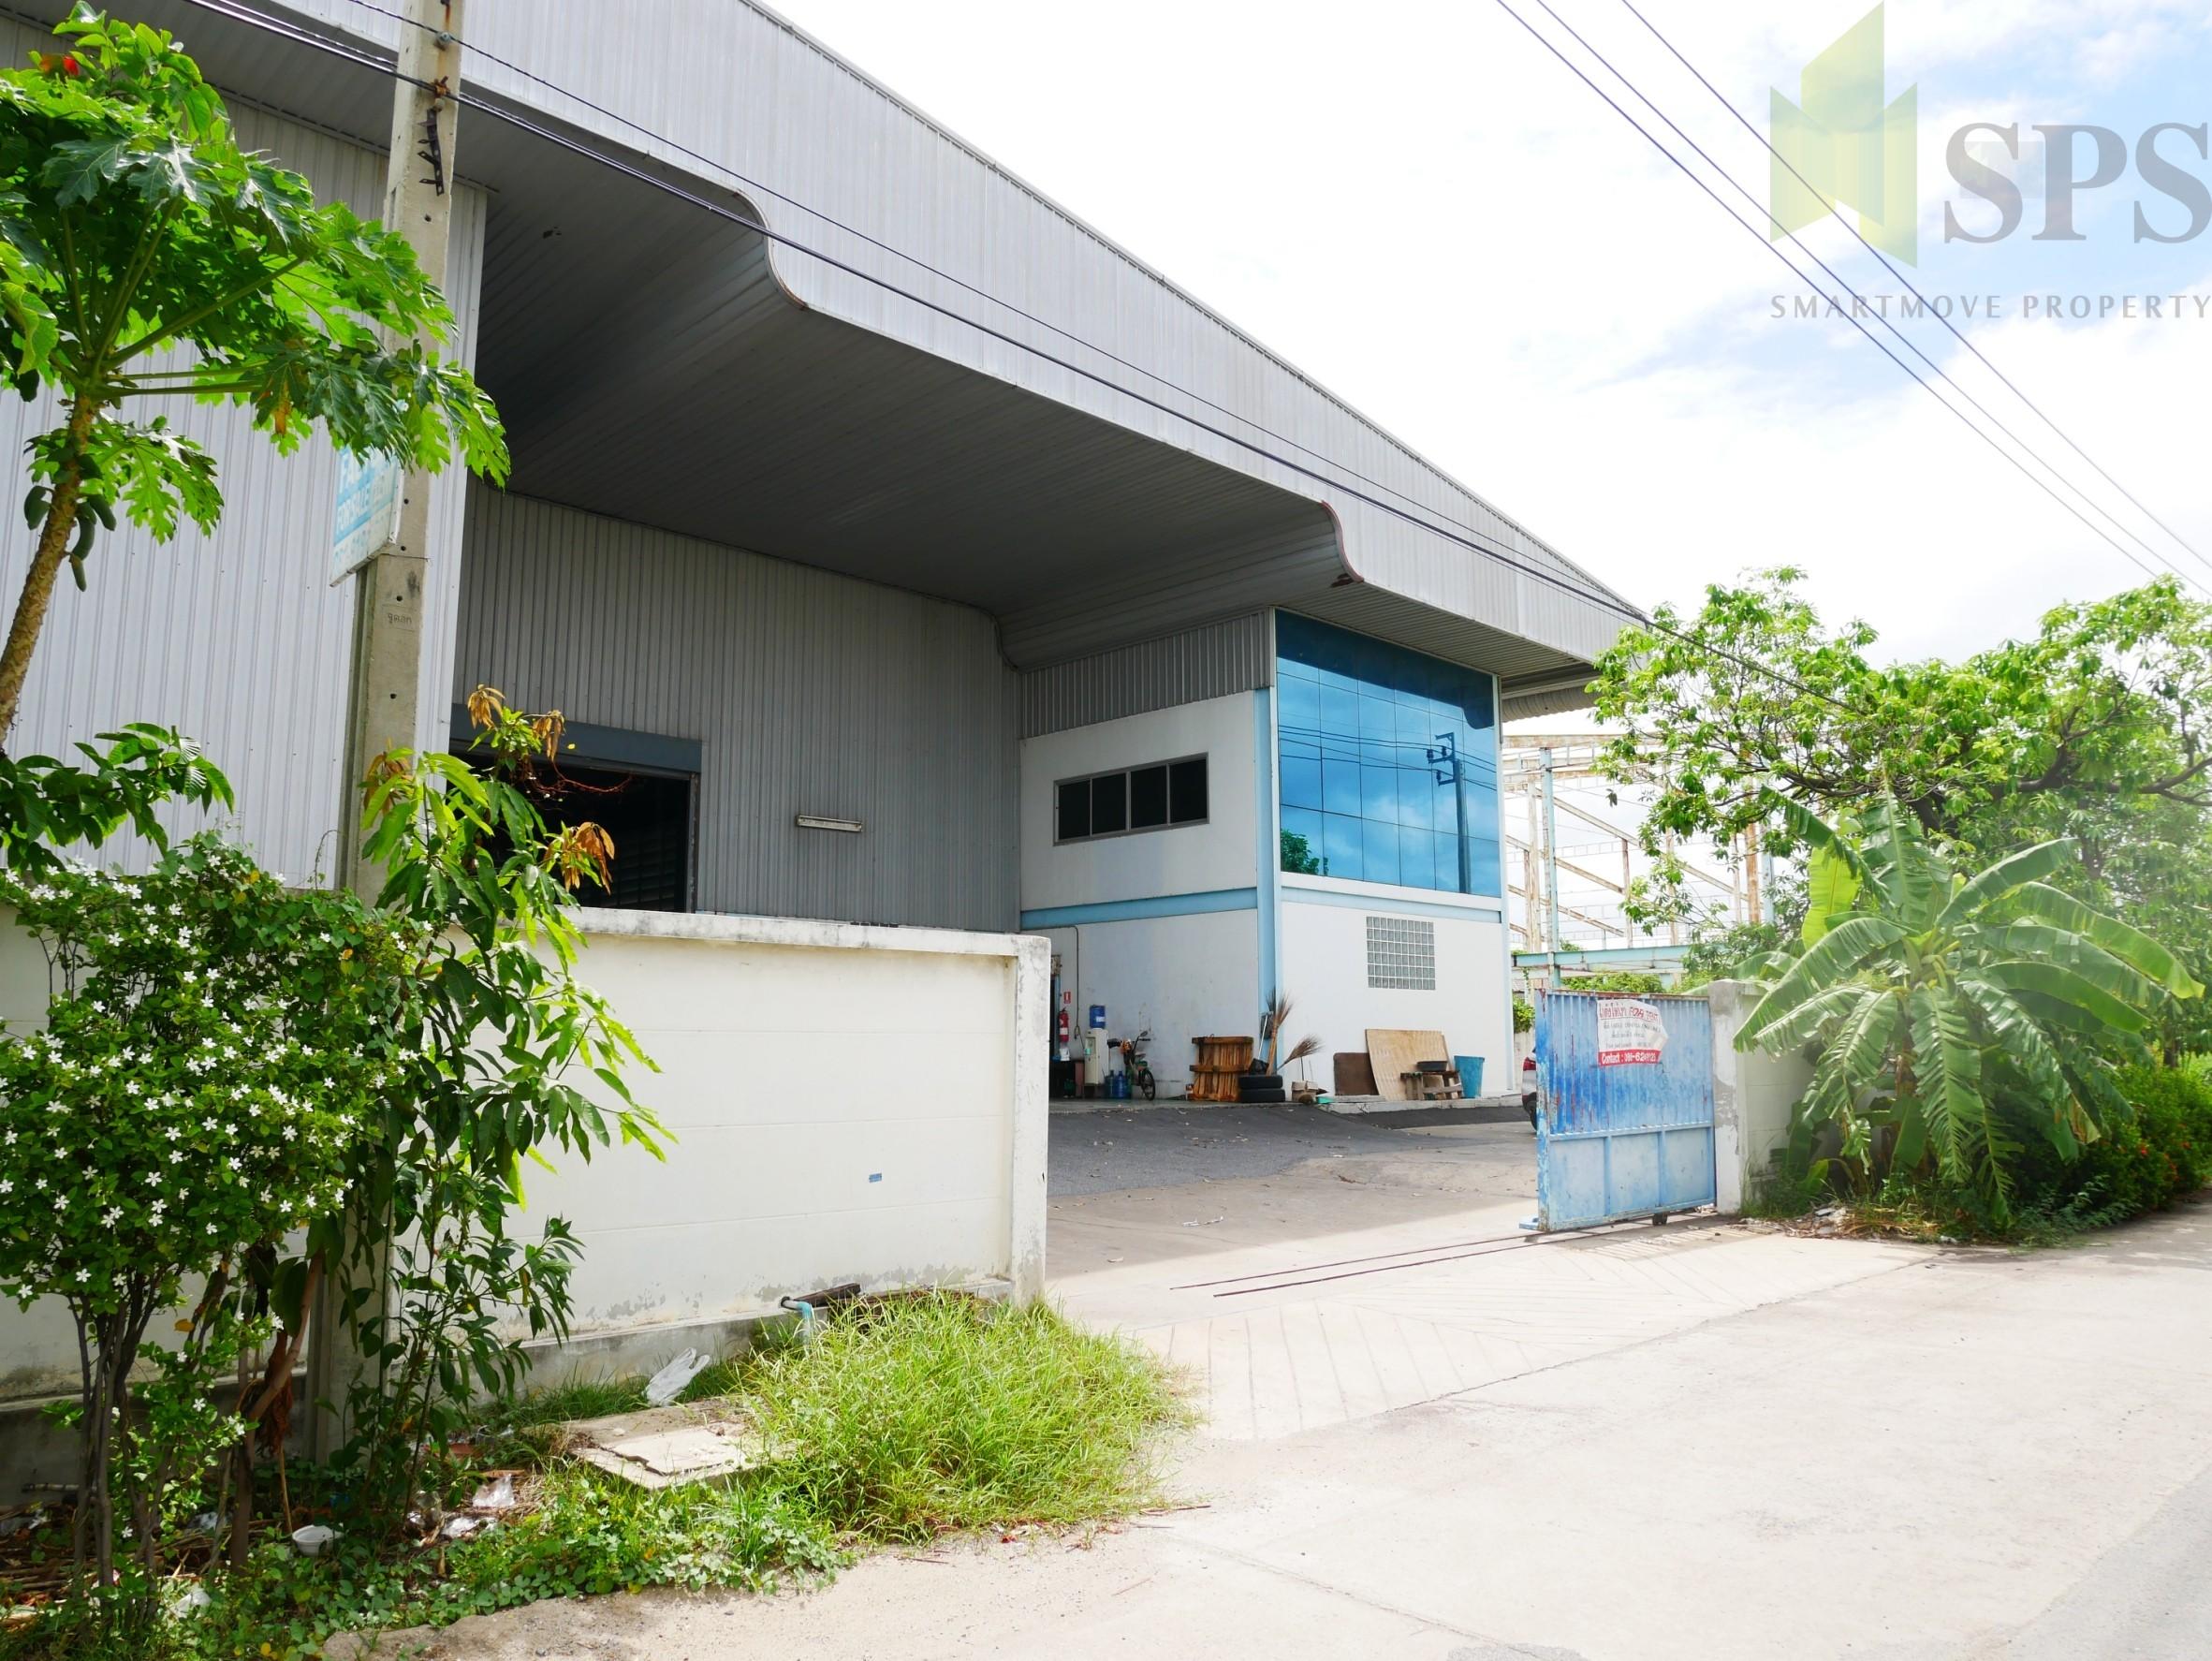 Warehouse for Rent at Bangplee-Tamru Road,( SPS-W013 )